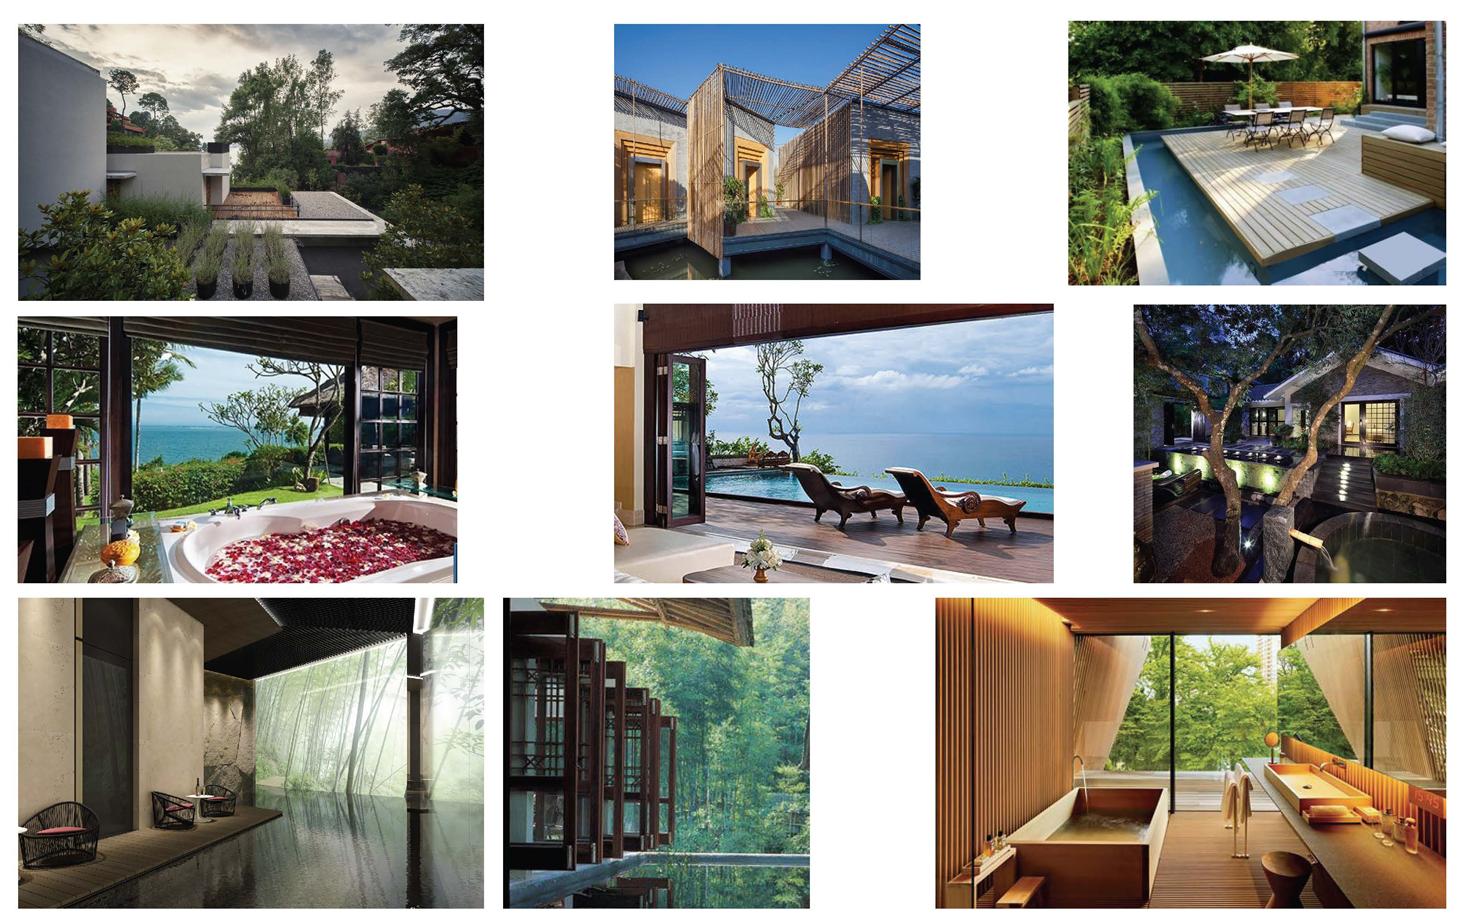 charles_tang_design_hangzhou_mangrove_tree_resort_villa_china 3